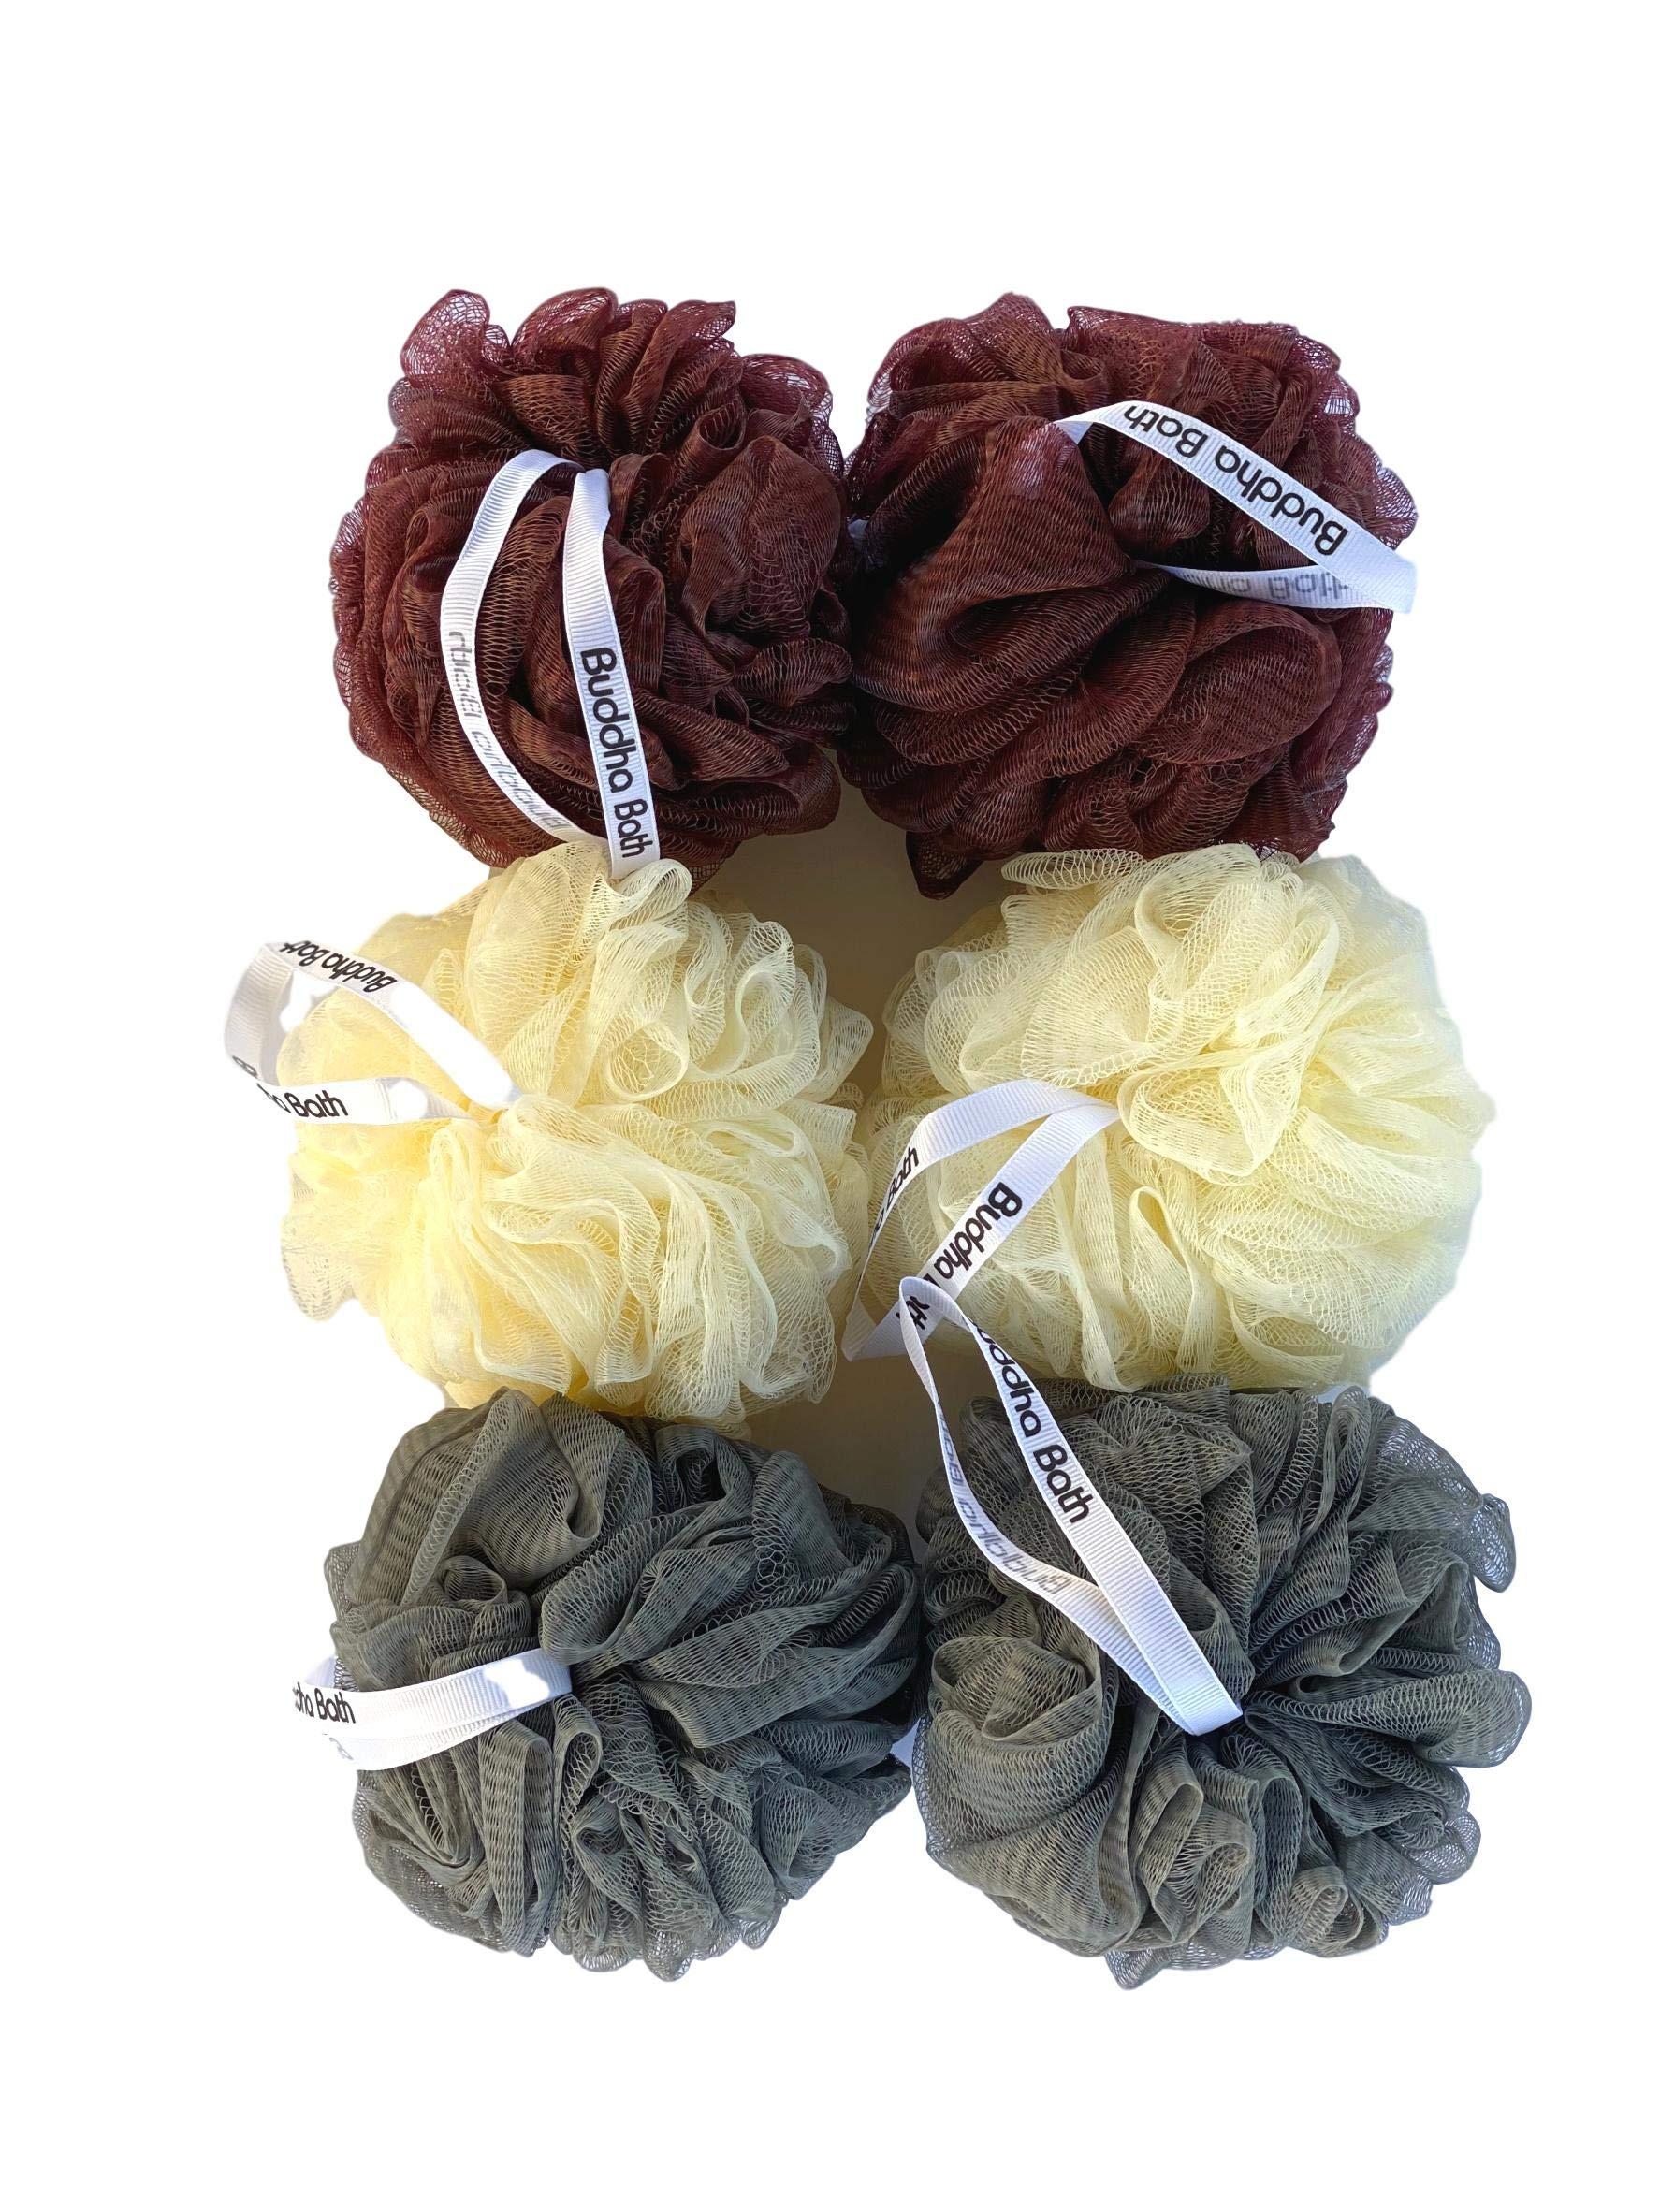 Buddha Bath Luxury Eco-Friendly Clean Mesh Bath Sponges 6 Pack Individually wrapped- Loofah - Lufa -luffa - Shower Pouf Ball - Washable